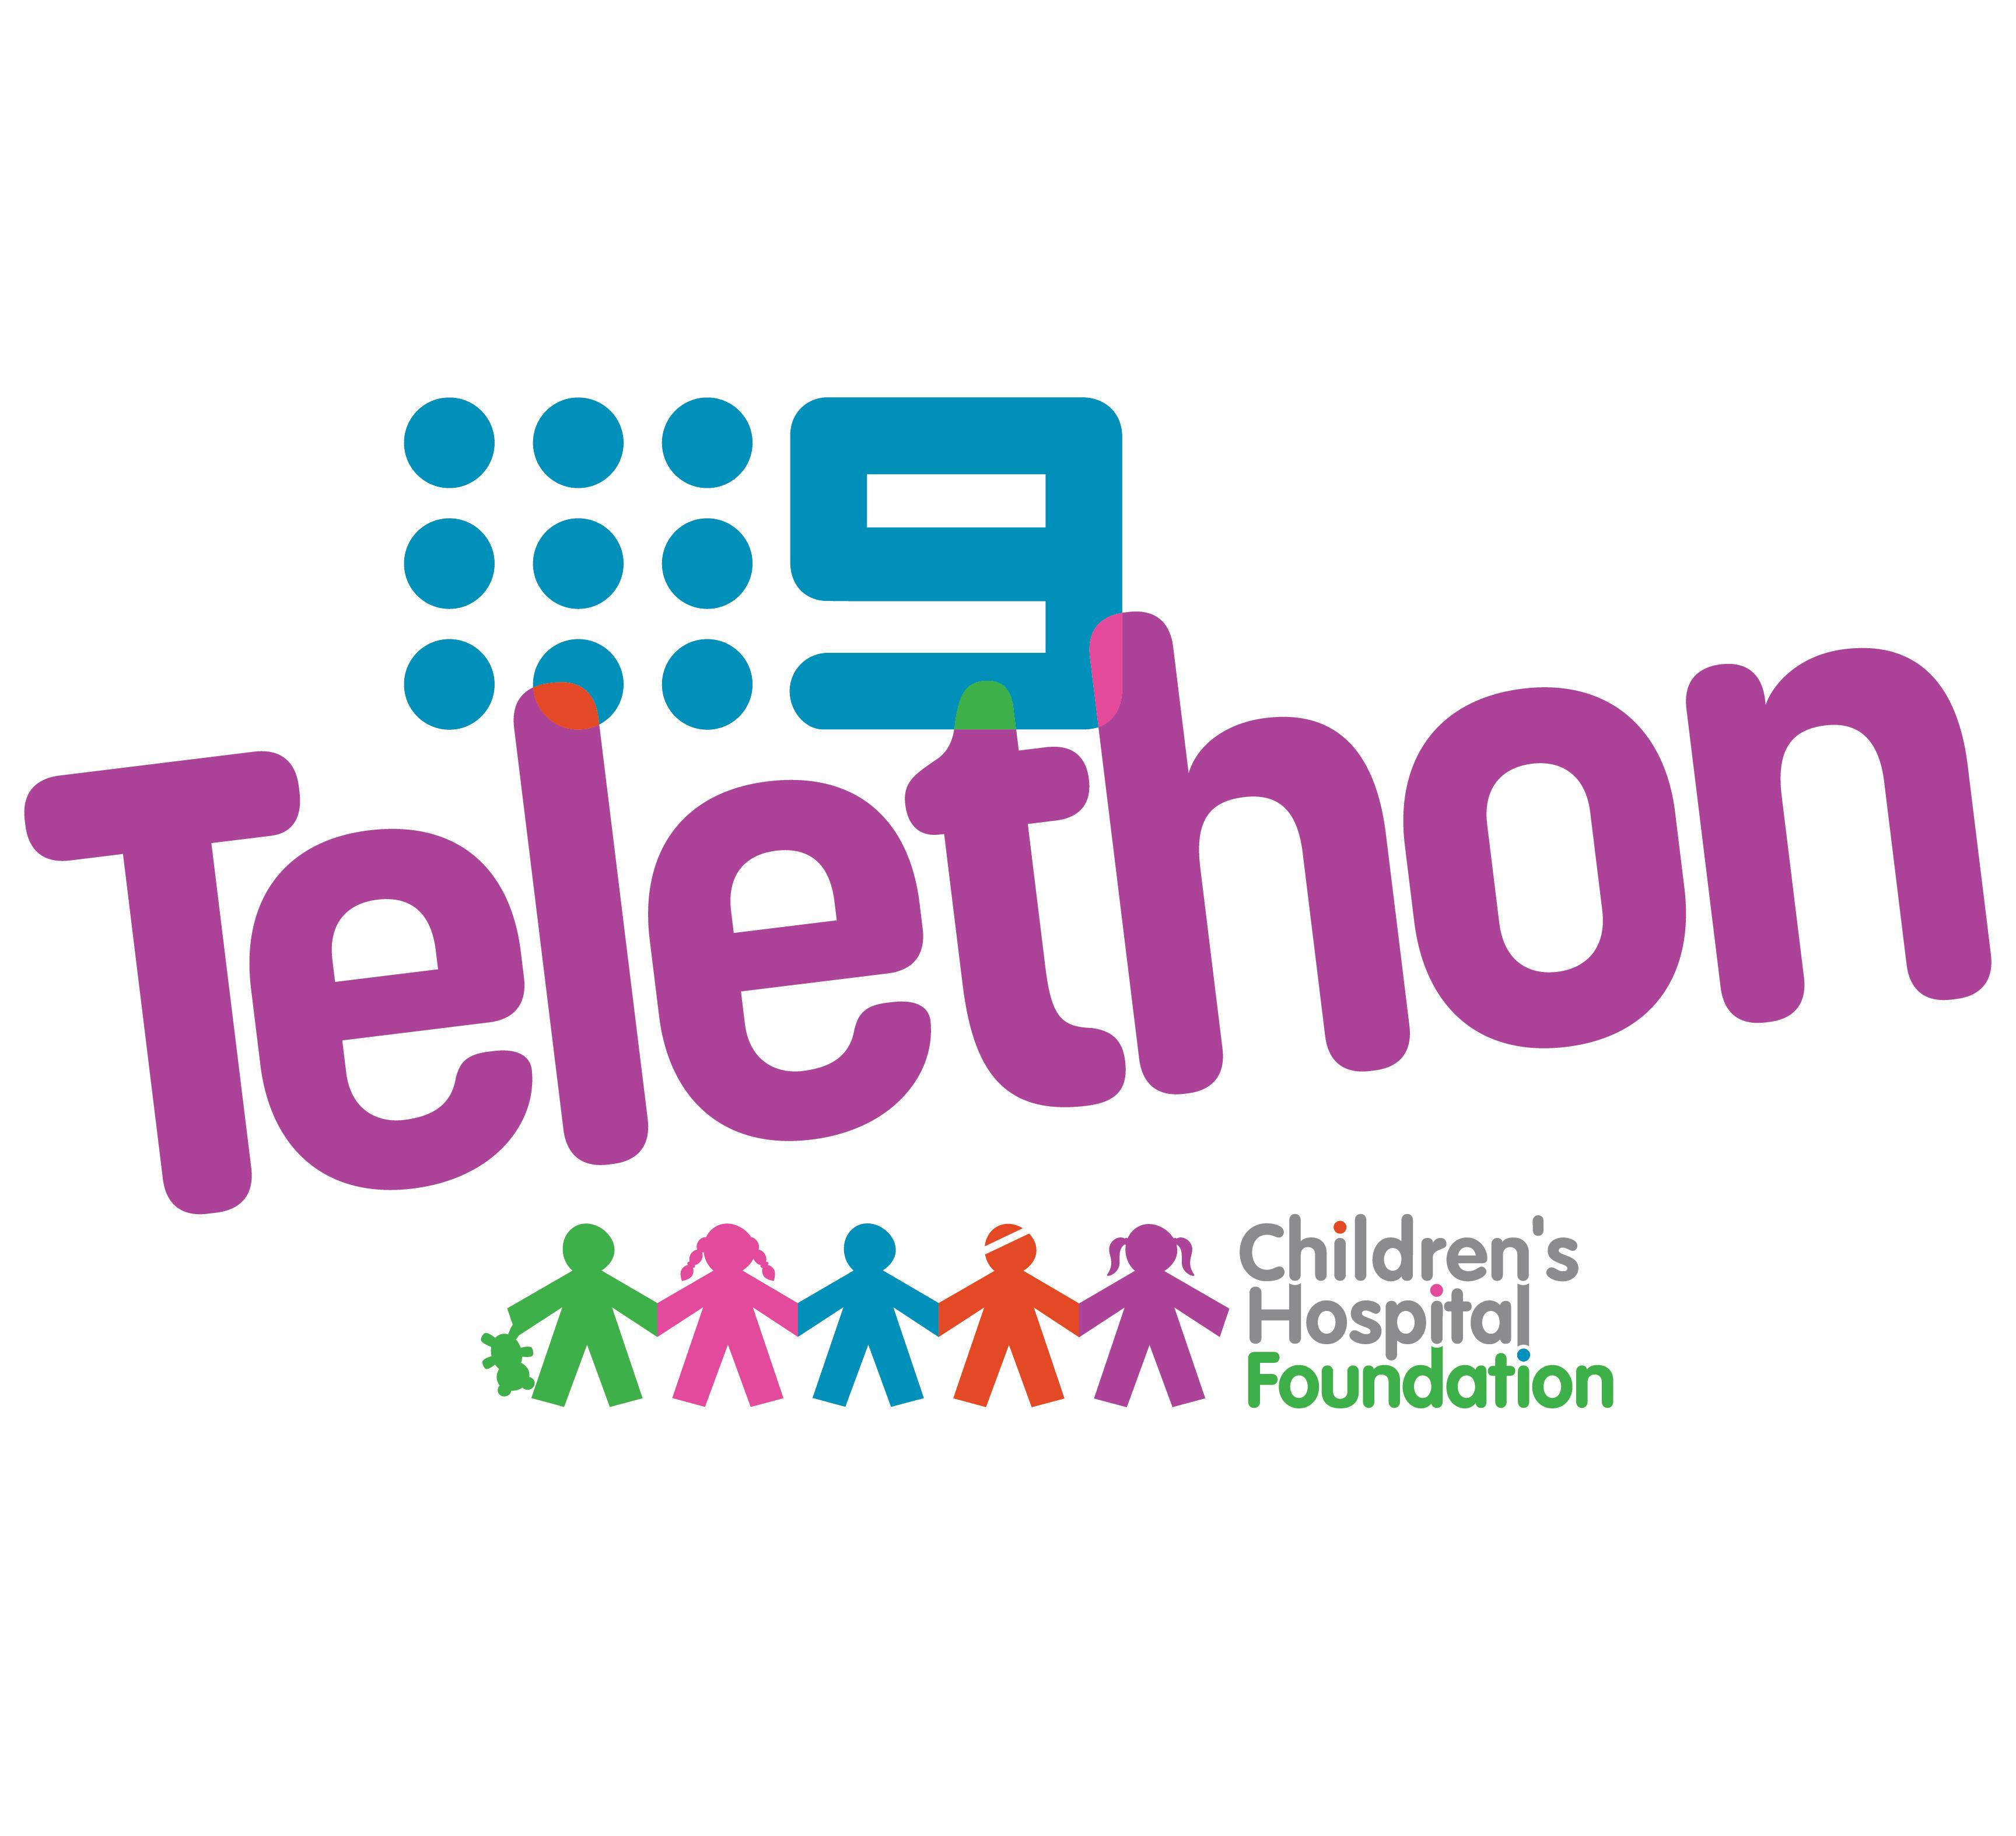 Children's Hospital Foundation 9Telethon